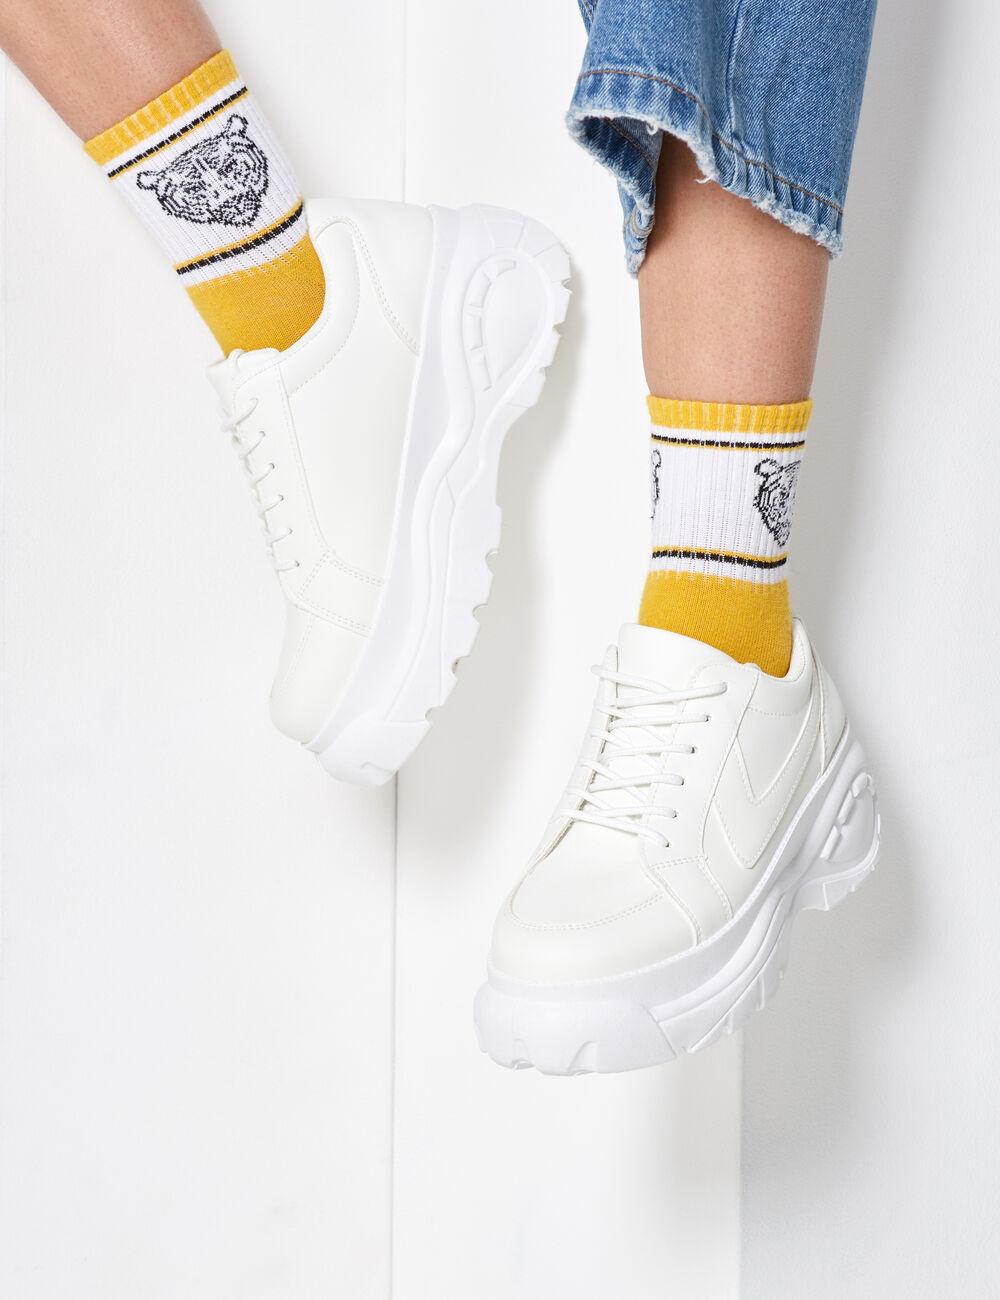 • Jennyfer ChaussuresBasketsSneakersDad Jennyfer • Jennyfer Shoes… Shoes… ChaussuresBasketsSneakersDad ChaussuresBasketsSneakersDad ChaussuresBasketsSneakersDad • Shoes… 8n0PXwOk